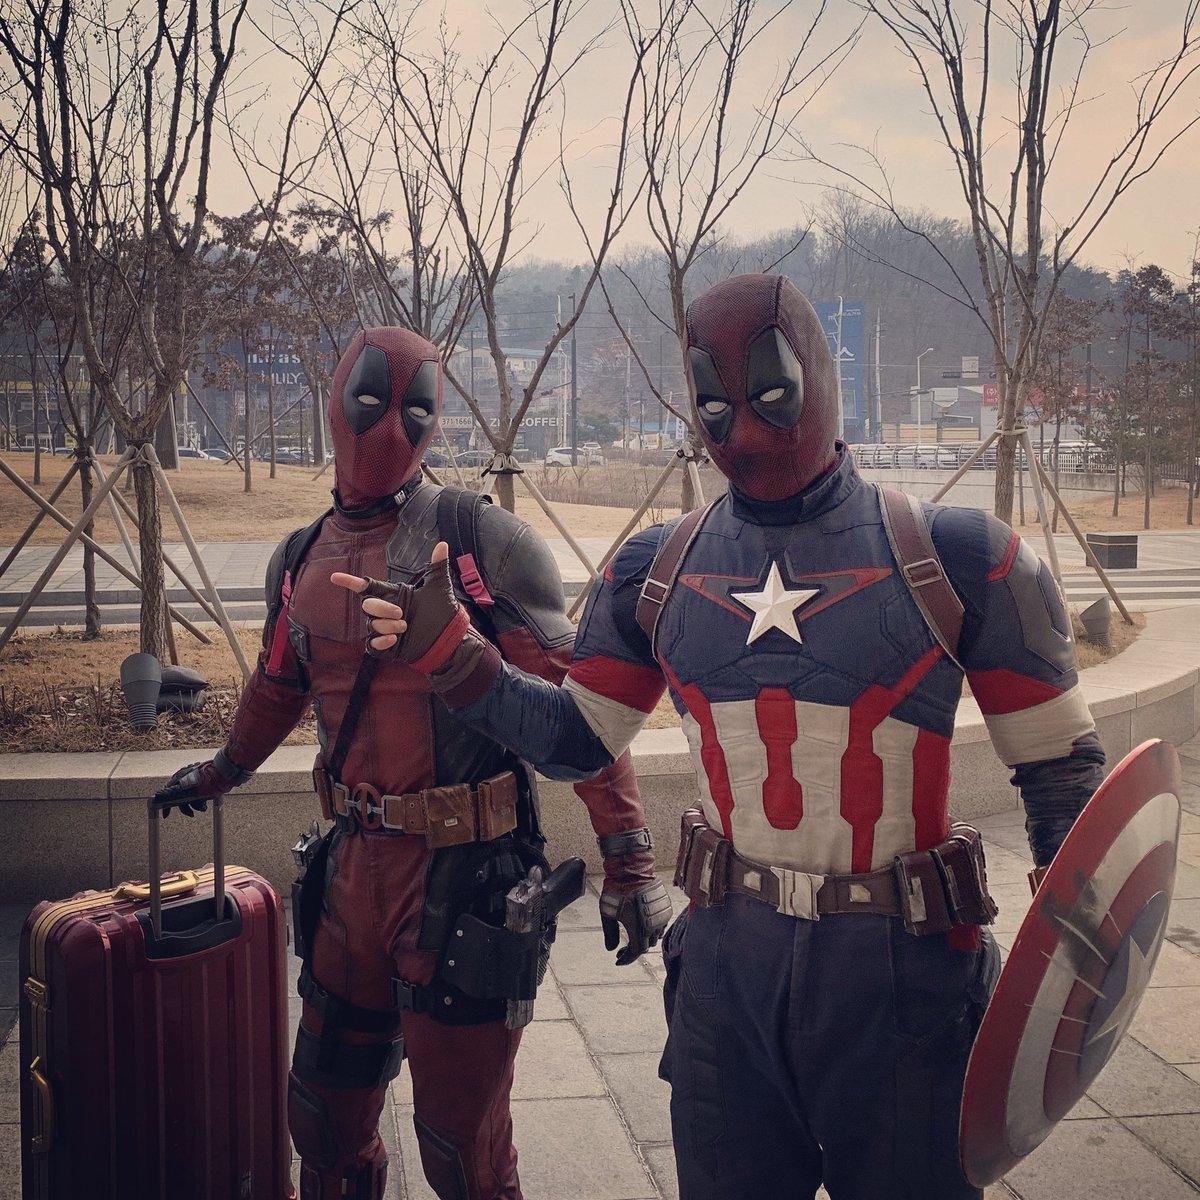 2 years ago, Dreams Come True. Welcome to the Avengers Team. Deadpool will Return.  #Deadpool #Deadpool3 @ChrisEvans @merc_dead_pool @VancityReynolds  #Avengers #Avengers5 #Xforce #Xmen #CaptainAmerica #CaptainDeadpool